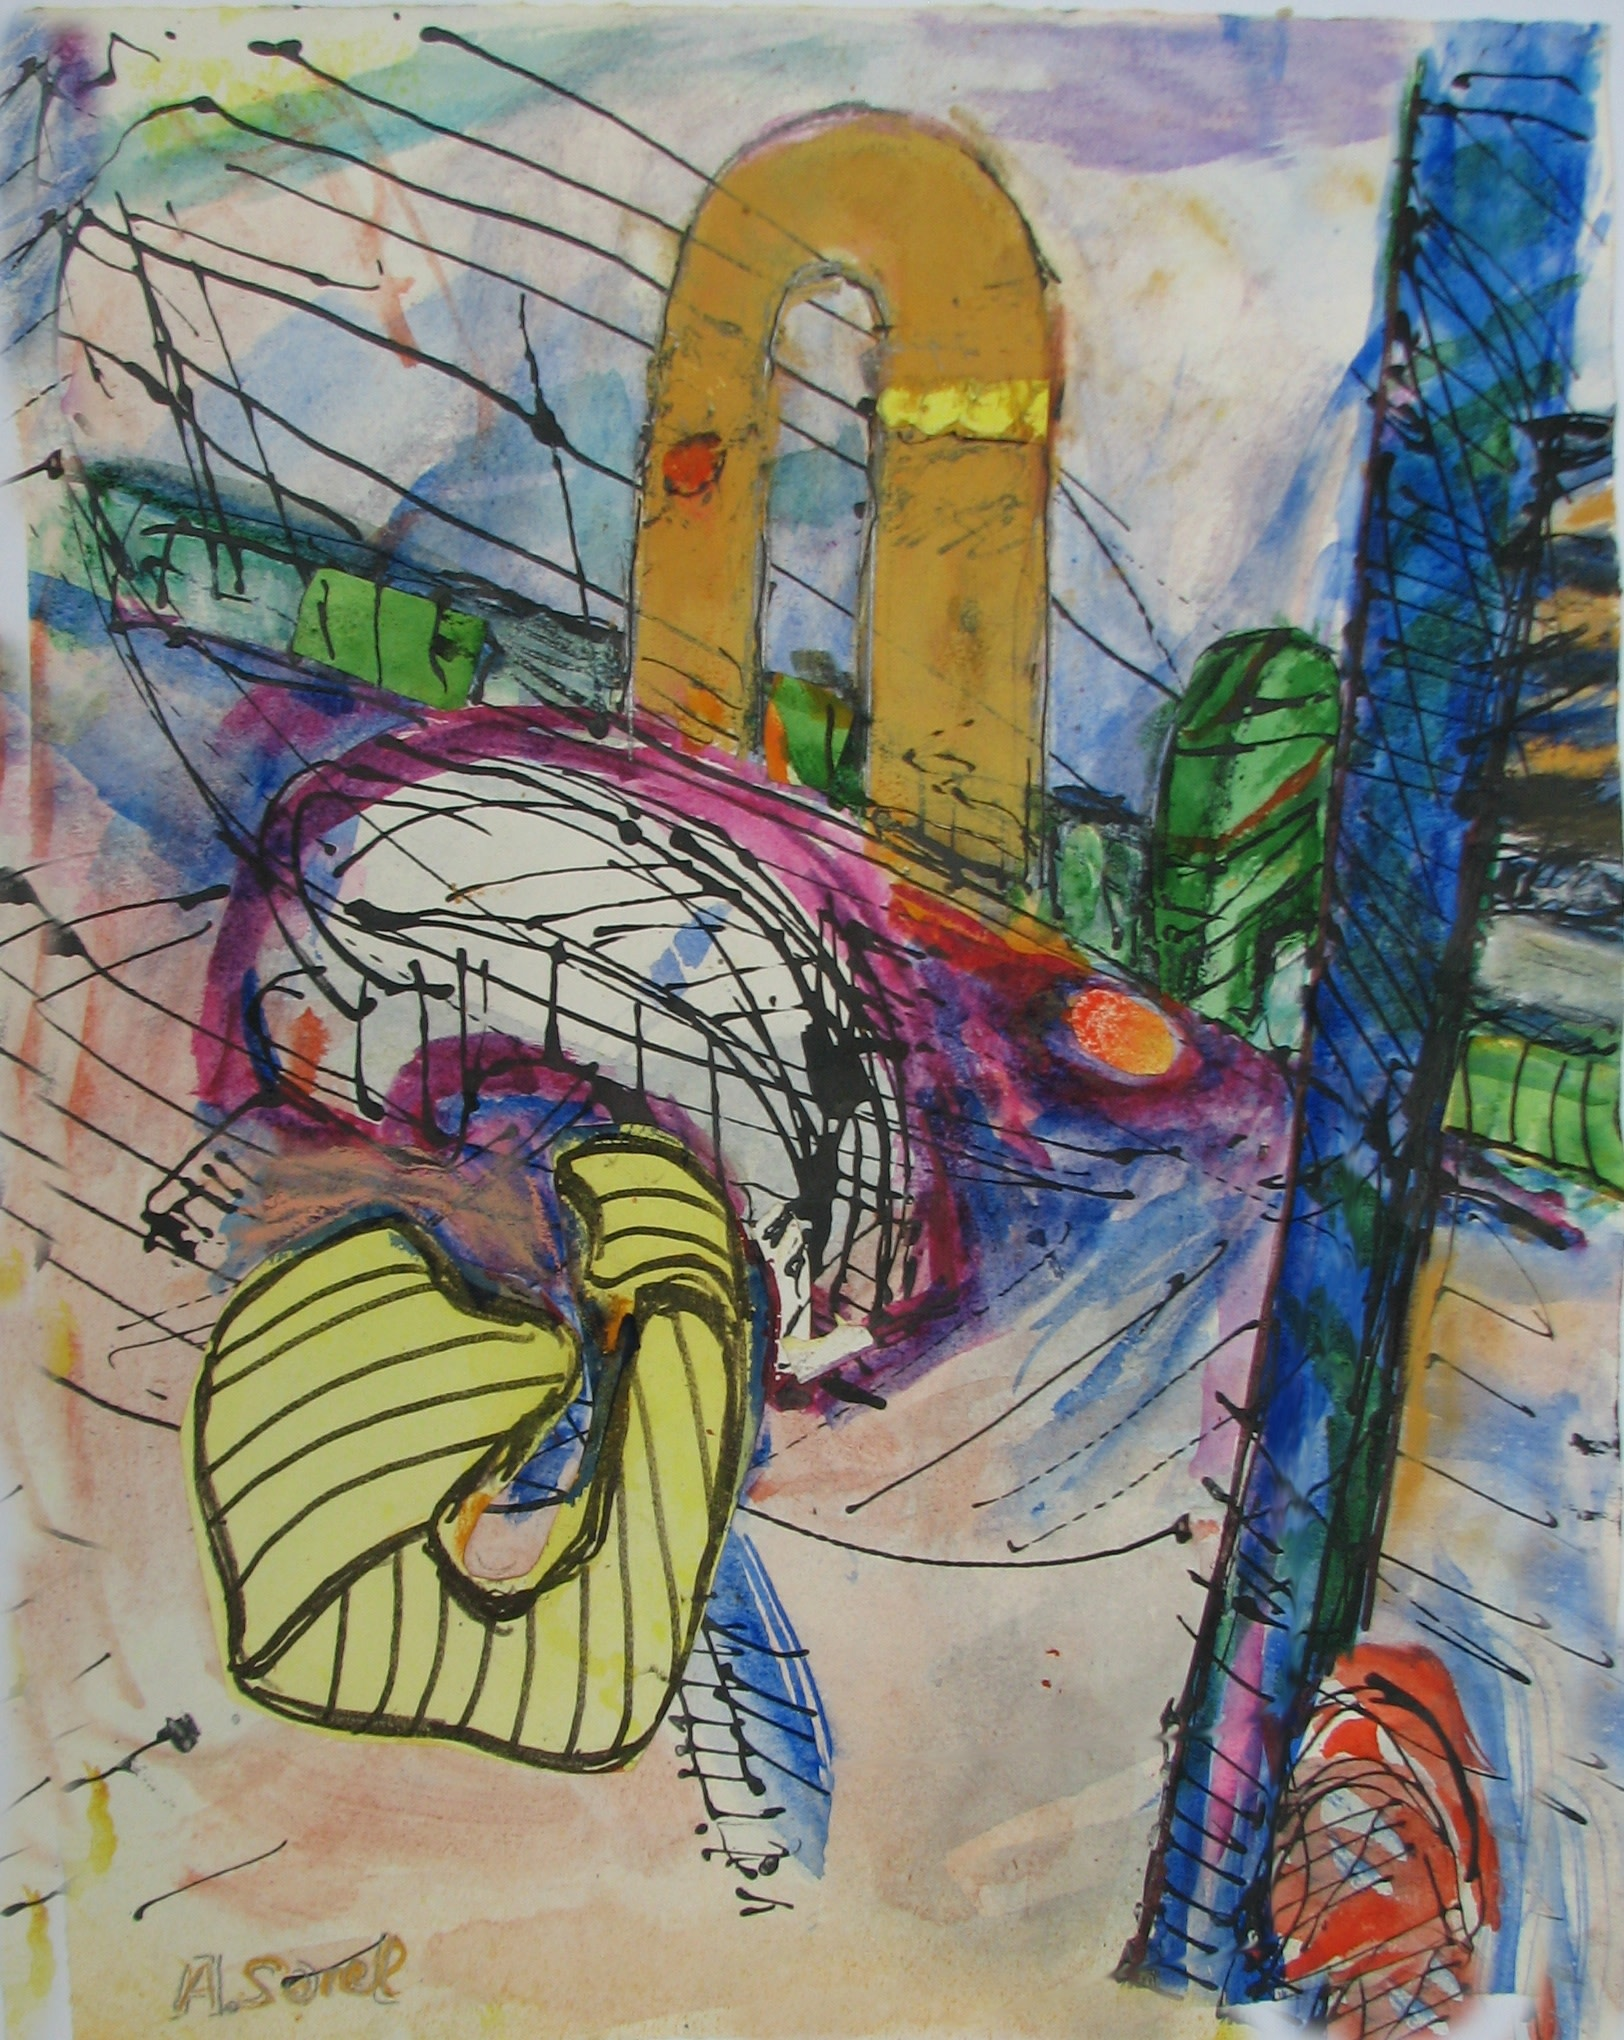 <span class=&#34;link fancybox-details-link&#34;><a href=&#34;/exhibitions/24/works/artworks_standalone10801/&#34;>View Detail Page</a></span><div class=&#34;artist&#34;><span class=&#34;artist&#34;><strong>Agathe Sorel</strong></span></div><div class=&#34;title&#34;><em>Studio in Morning Light</em></div><div class=&#34;medium&#34;>watercolour & collage</div><div class=&#34;dimensions&#34;>65x54cm</div>